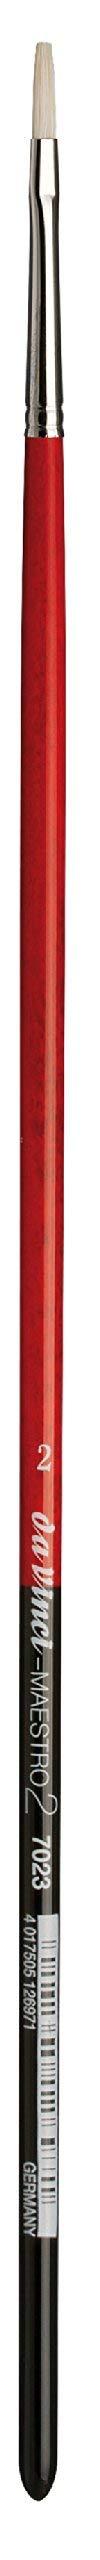 da Vinci Hog Bristle Series 7023 Maestro 2 Artist Paint Brush, Flat with European Sizing, Size 2